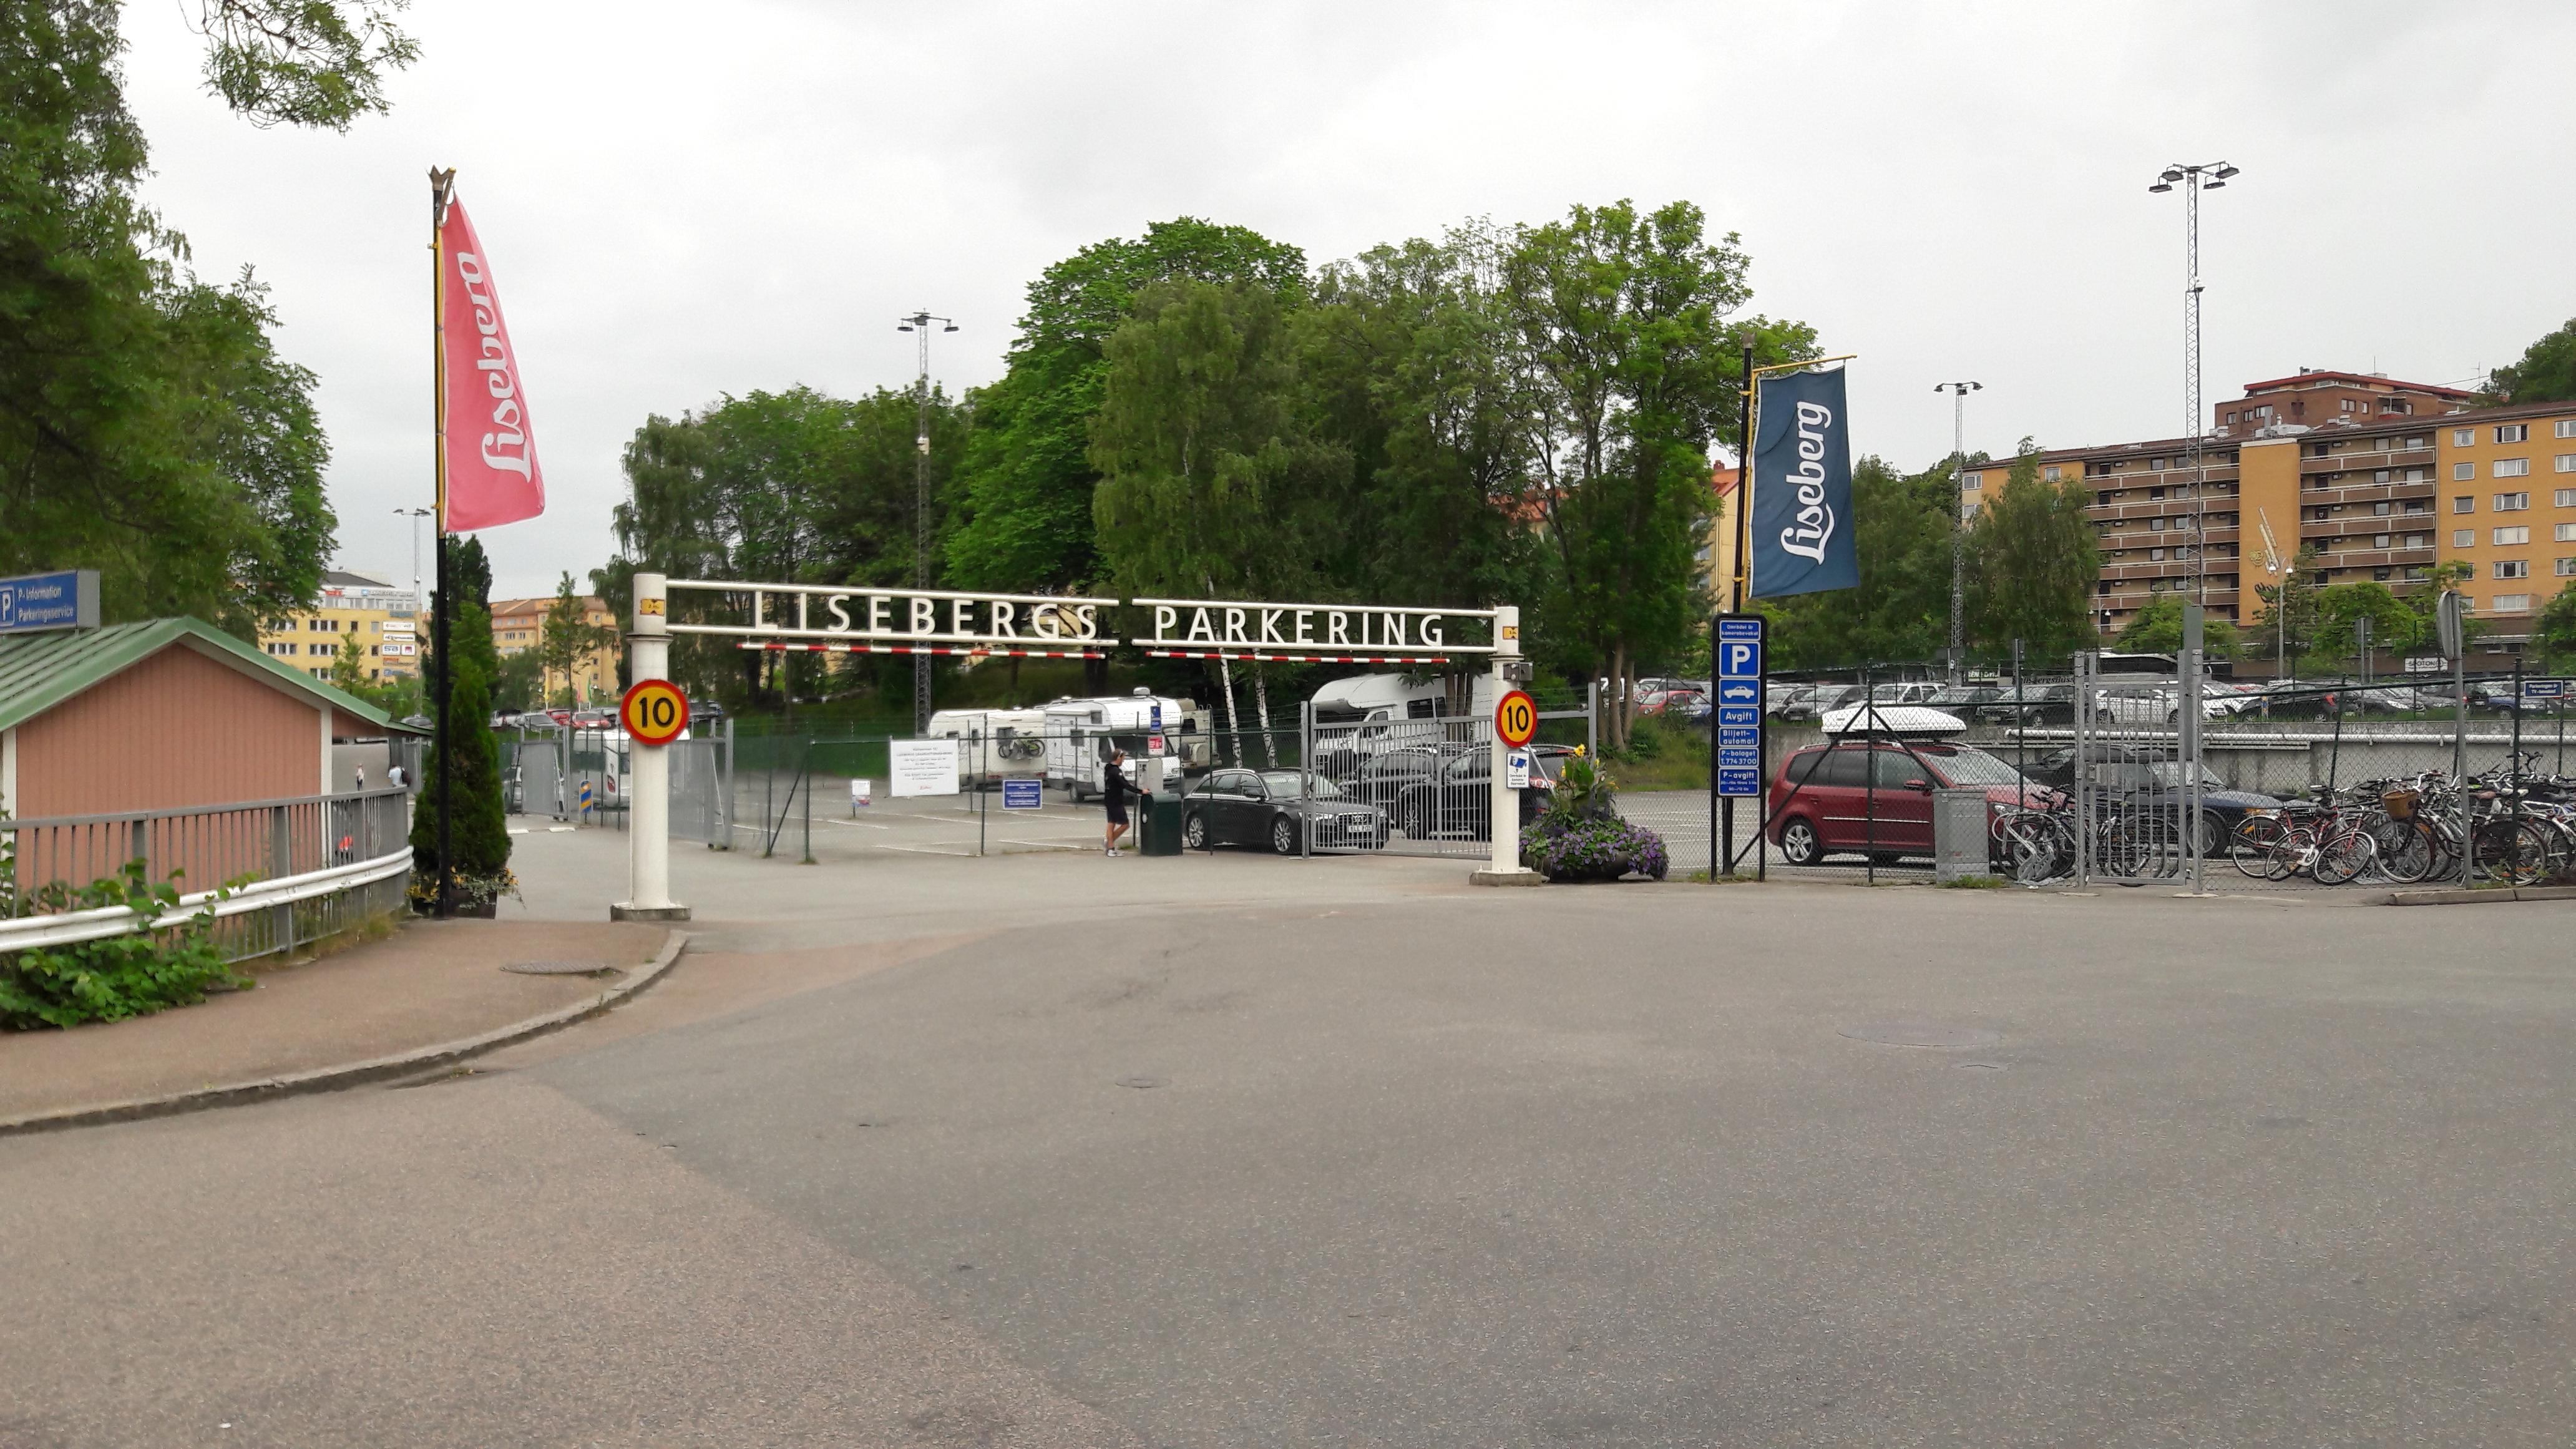 parkering liseberg karta Liseberg Södra   Parkerar i Gothenburg | ParkMe parkering liseberg karta